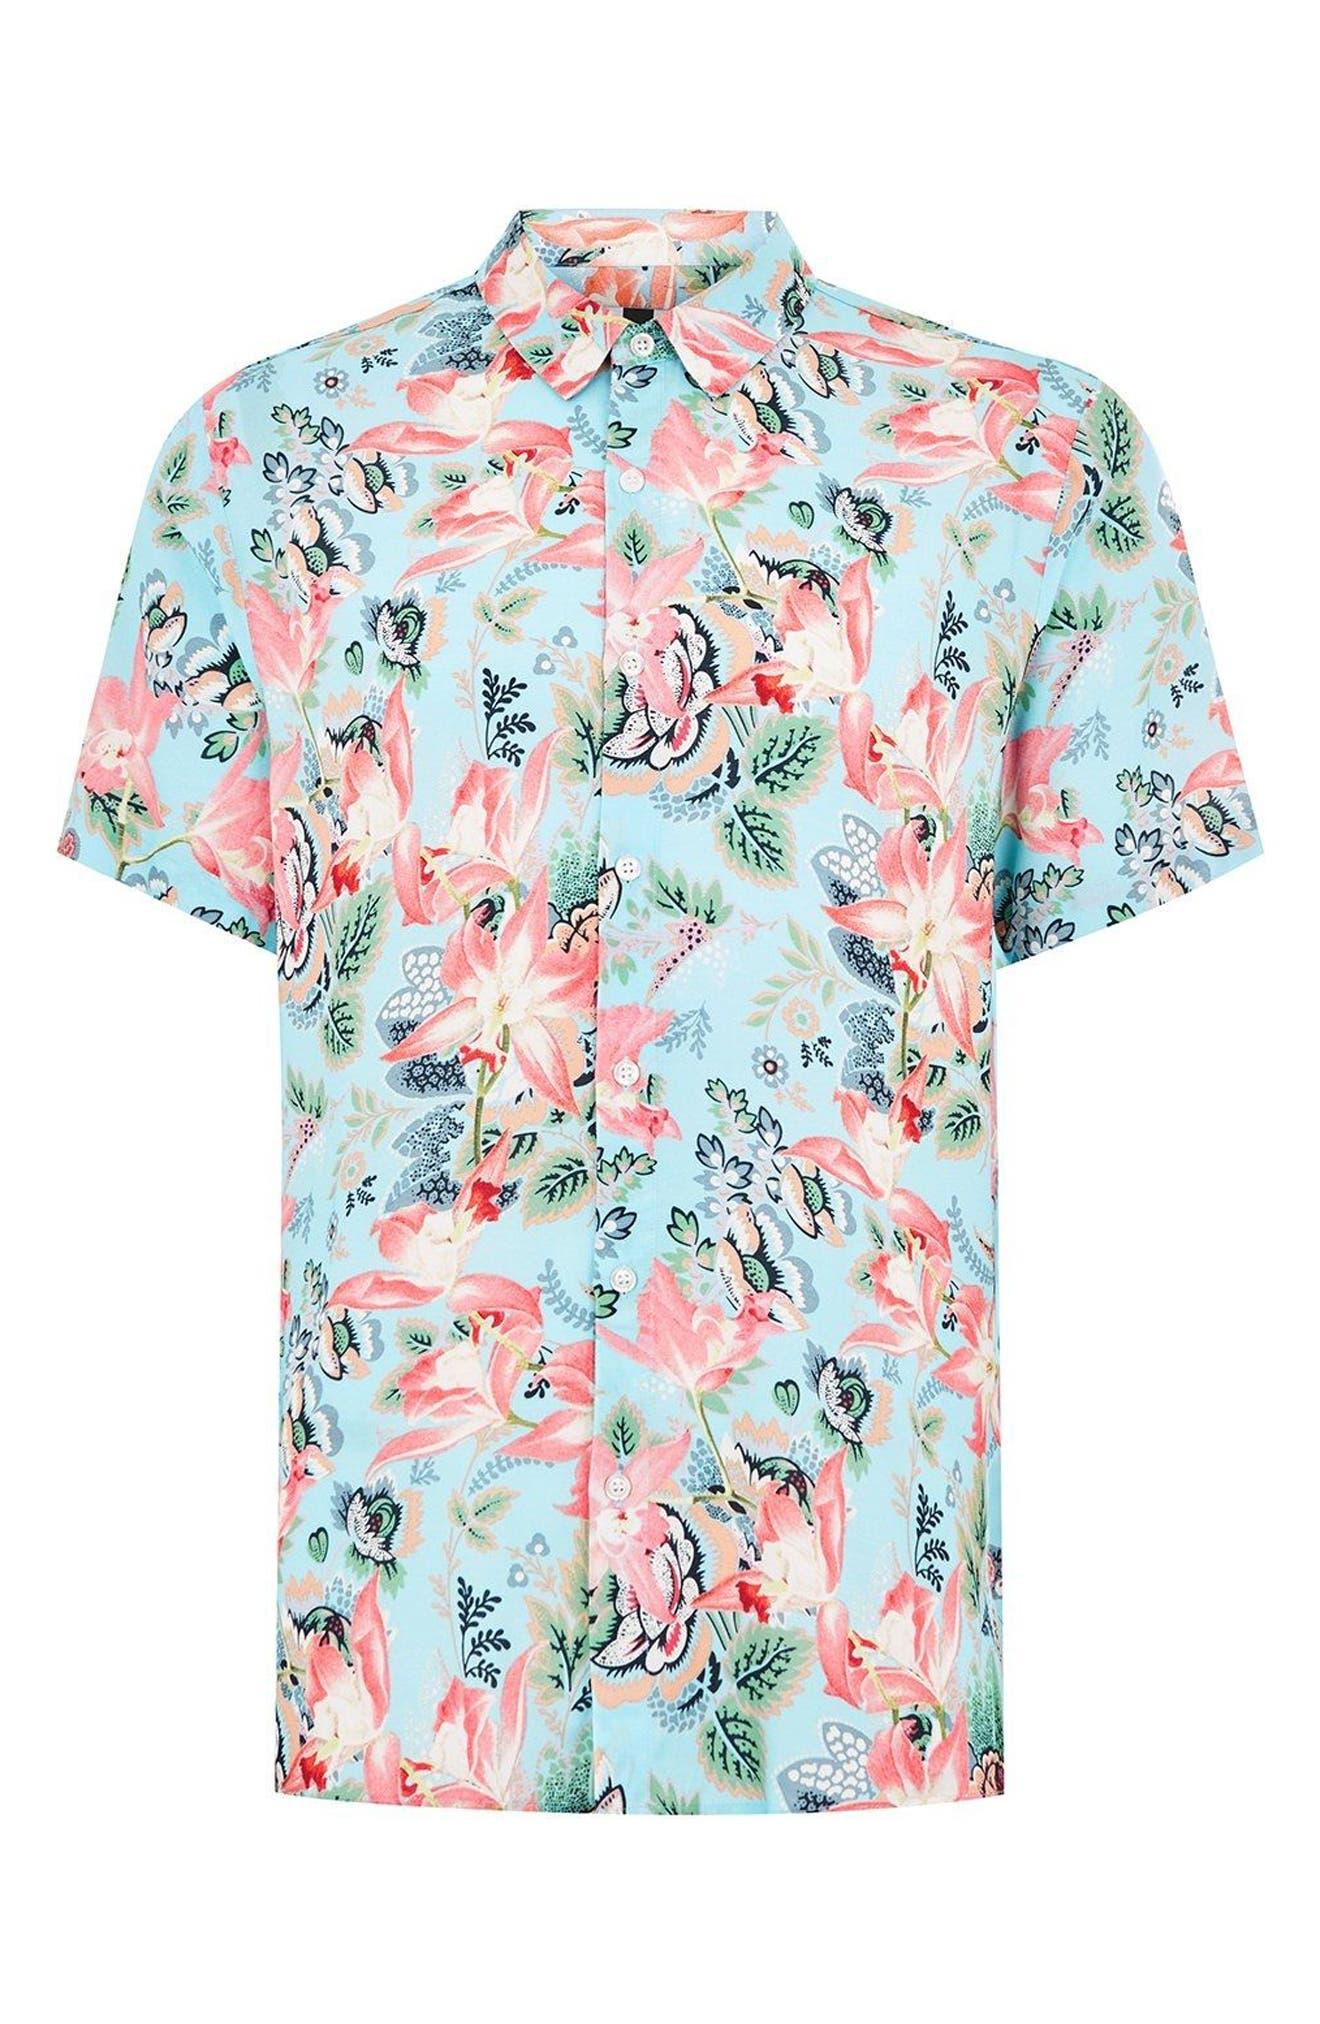 Floral Print Shirt,                             Alternate thumbnail 2, color,                             400